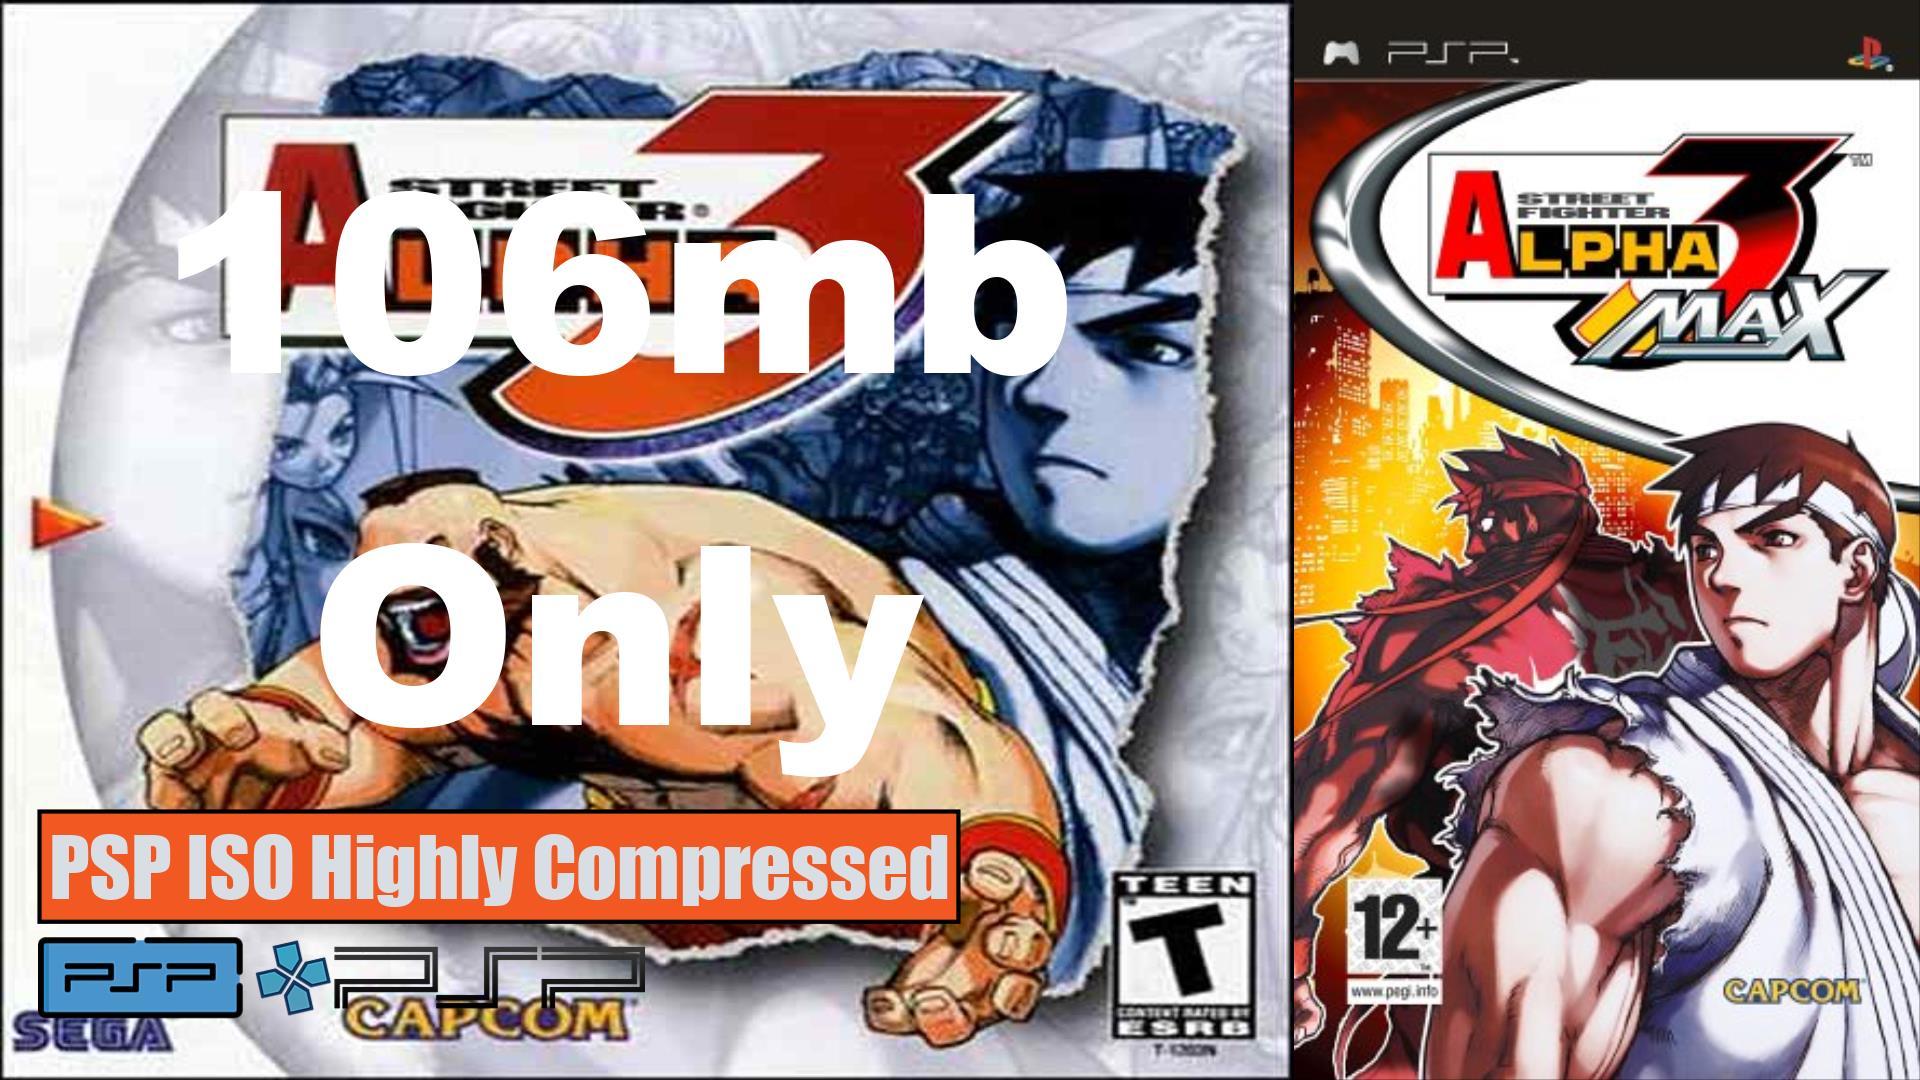 Street Fighter Alpha 3 PSP ISO Highly Compressed